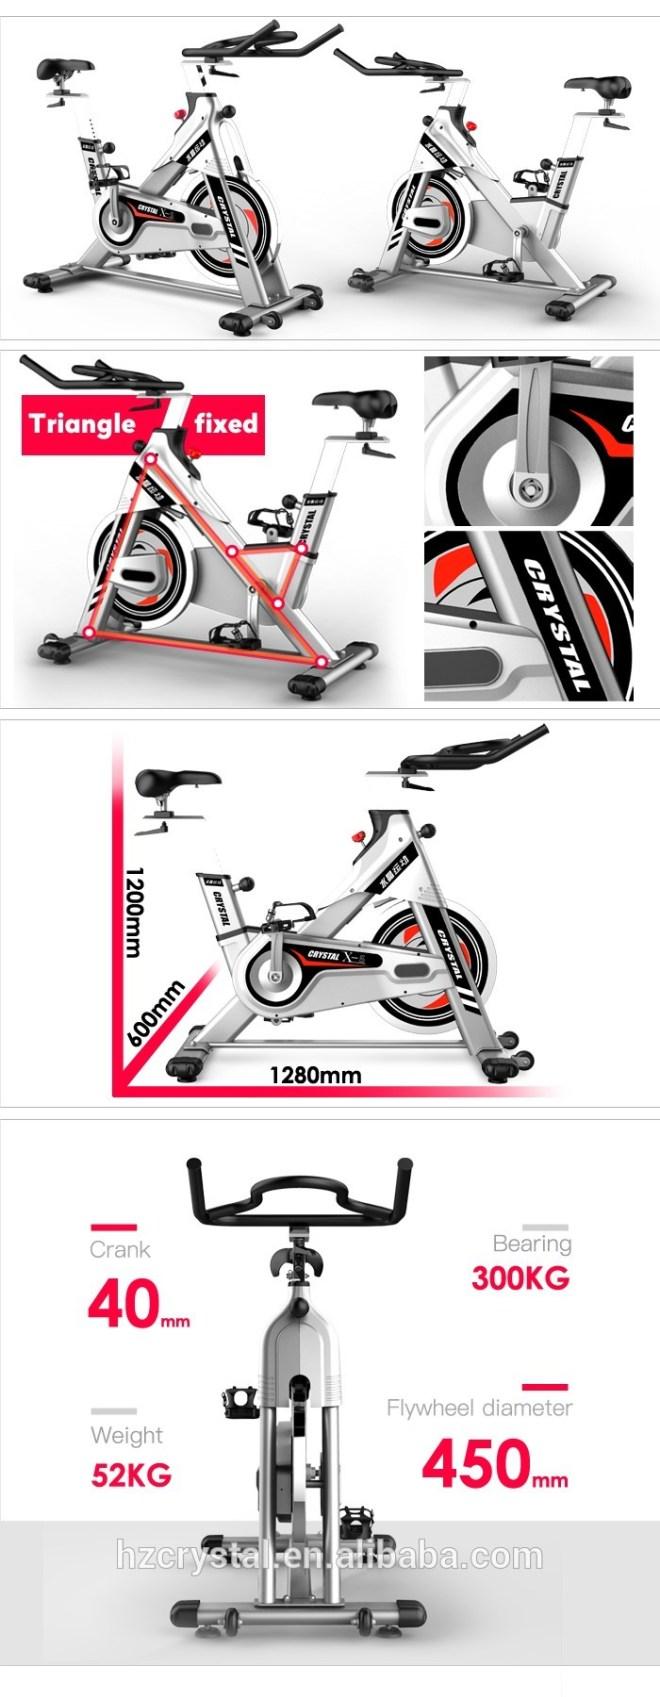 SJ-X5 Indoor Fitness Exercise Gym Equipment Spin Bike for Exercise